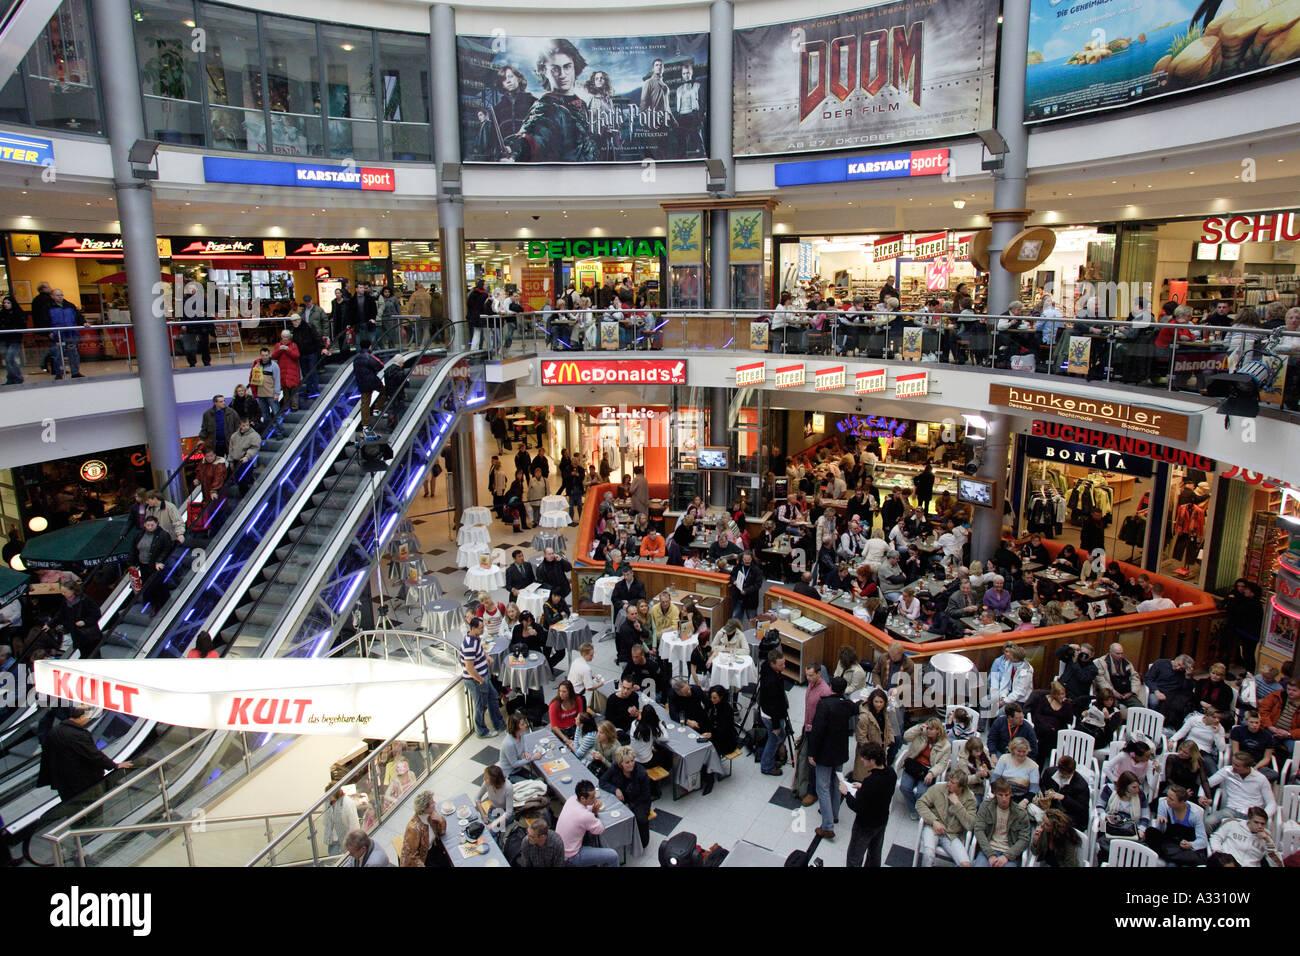 gropius passagen shopping center berlin germany stock photo royalty free image 10653336 alamy. Black Bedroom Furniture Sets. Home Design Ideas